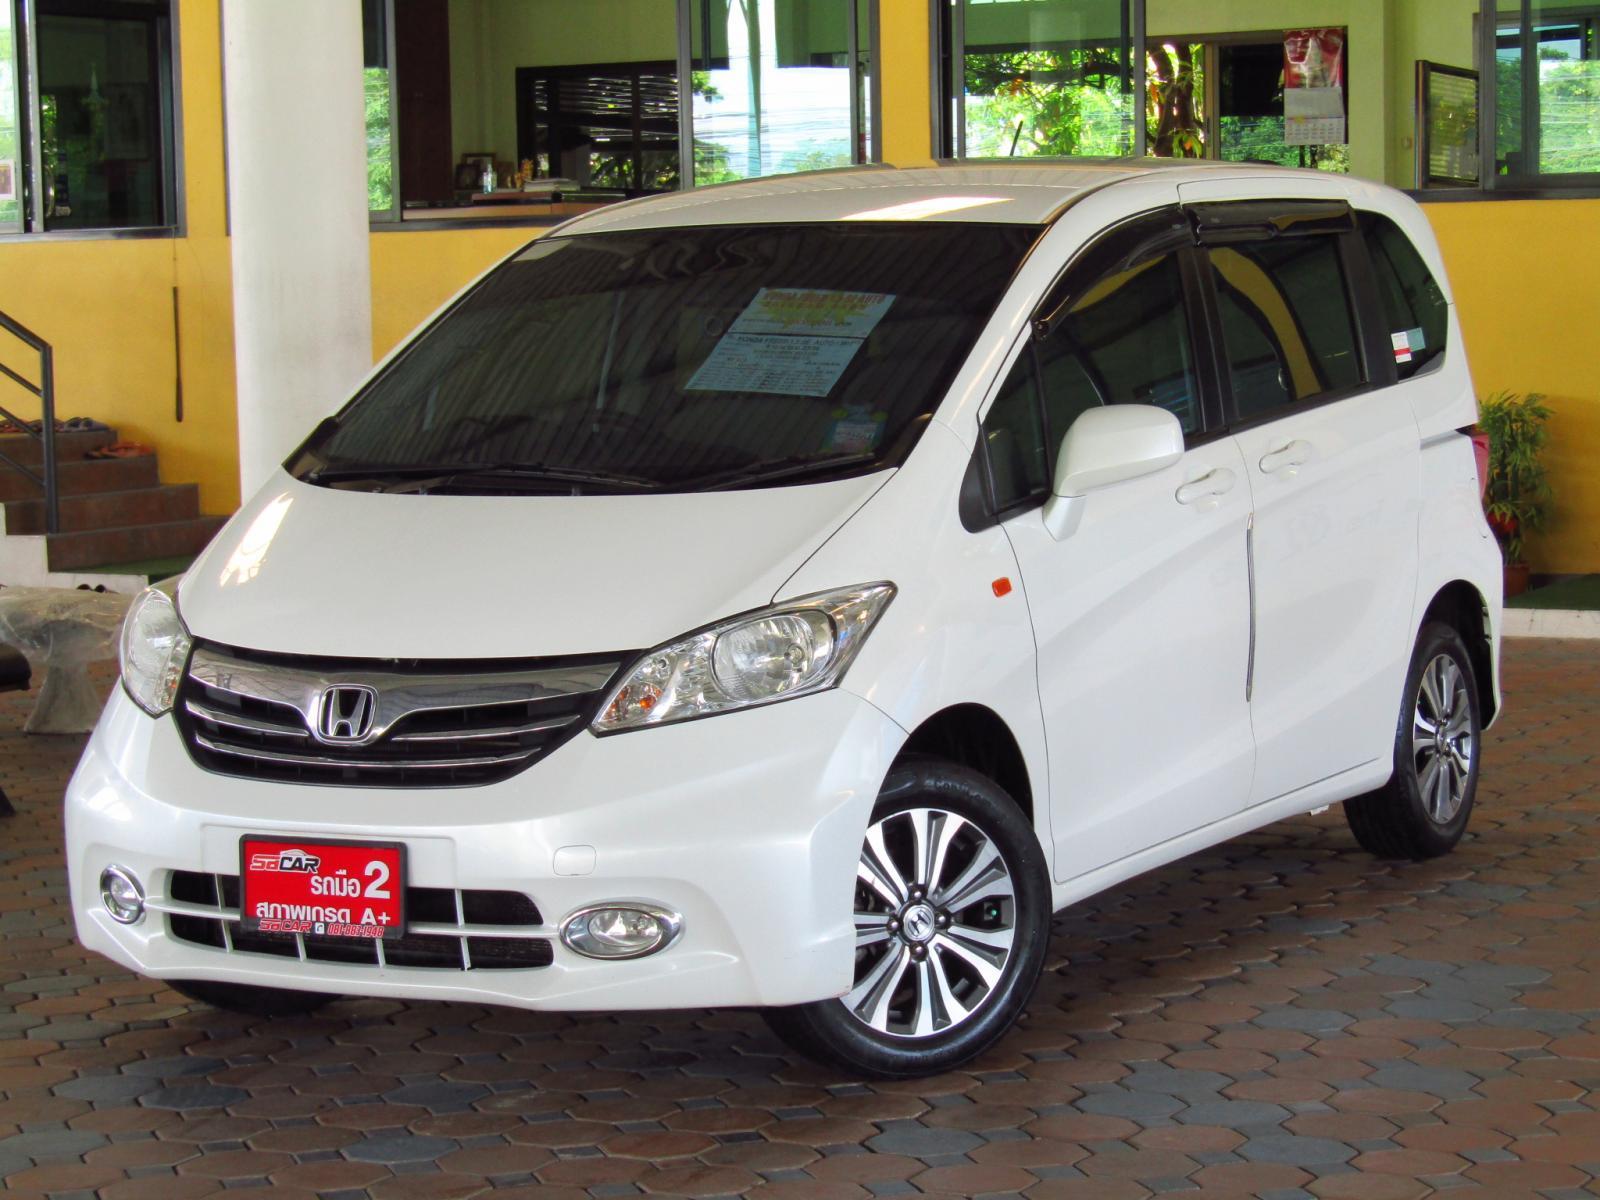 2013 Honda Freed 1.5 SE 80041 | ขายรถฮอนด้า.com